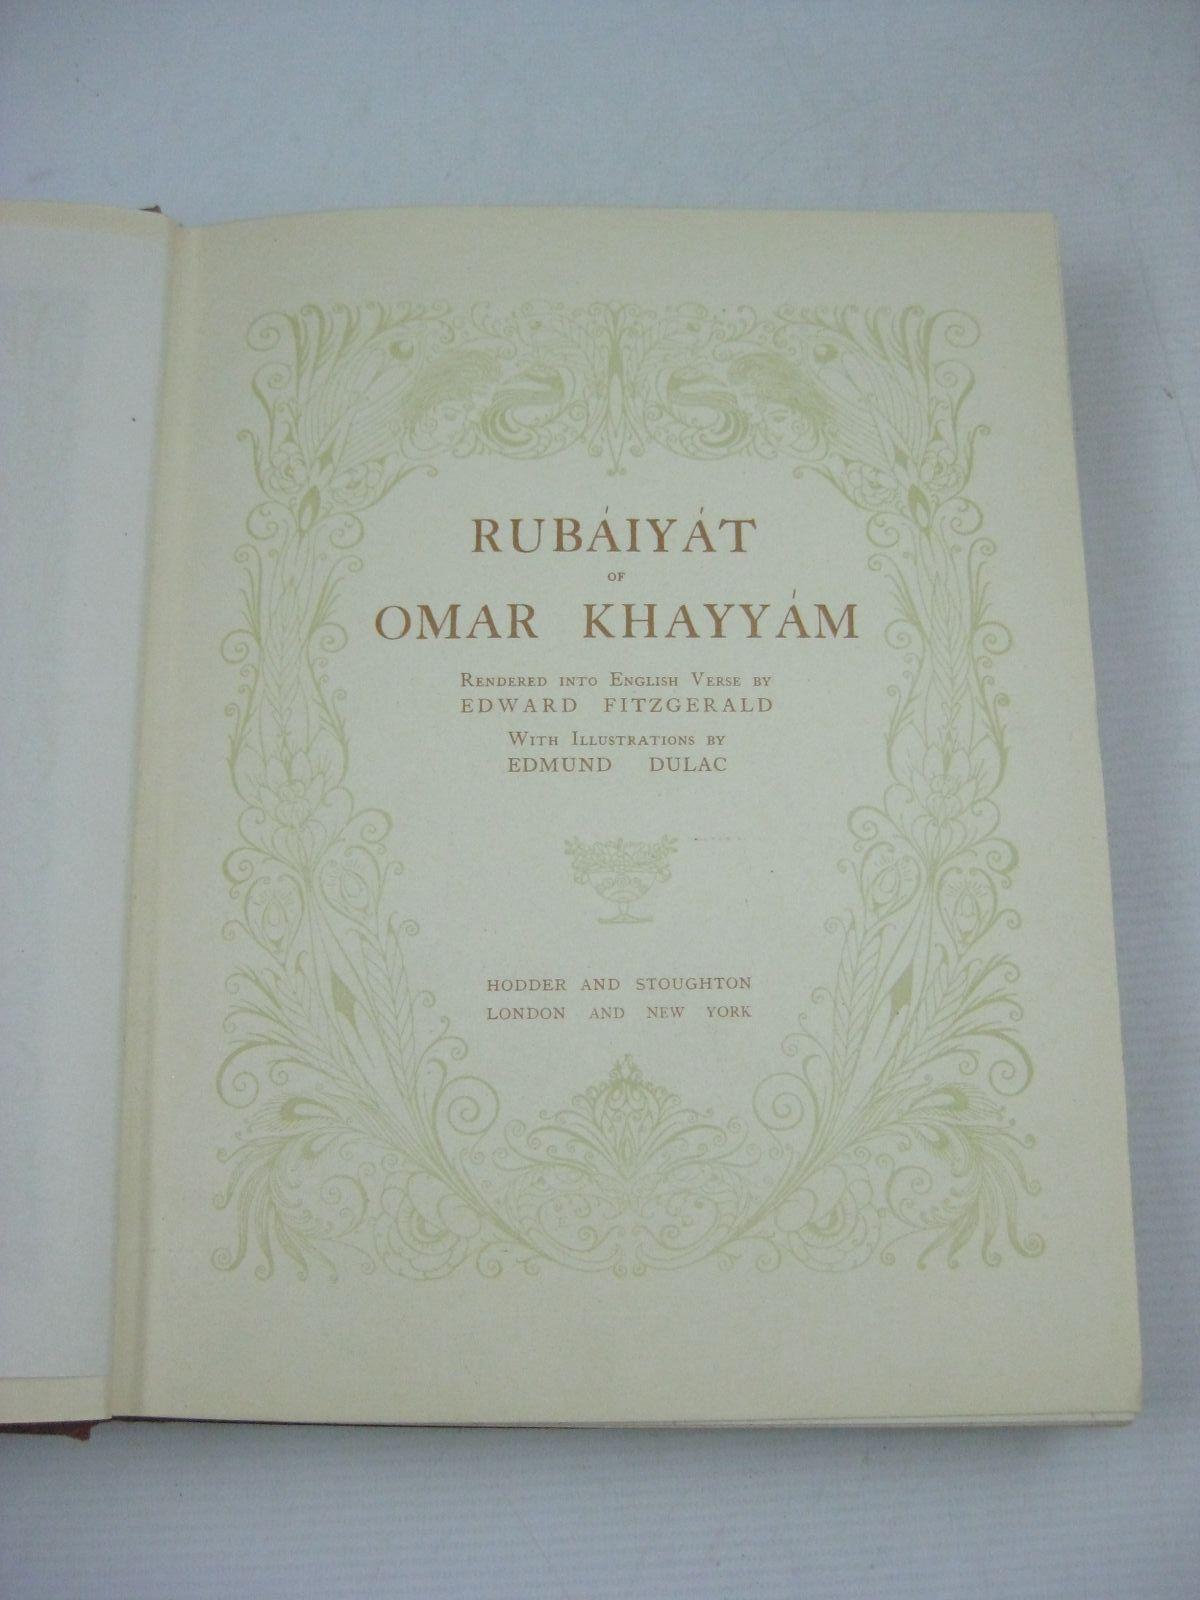 Photo of RUBAIYAT OF OMAR KHAYYAM written by Khayyam, Omar Fitzgerald, Edward illustrated by Dulac, Edmund published by Hodder & Stoughton (STOCK CODE: 1404947)  for sale by Stella & Rose's Books